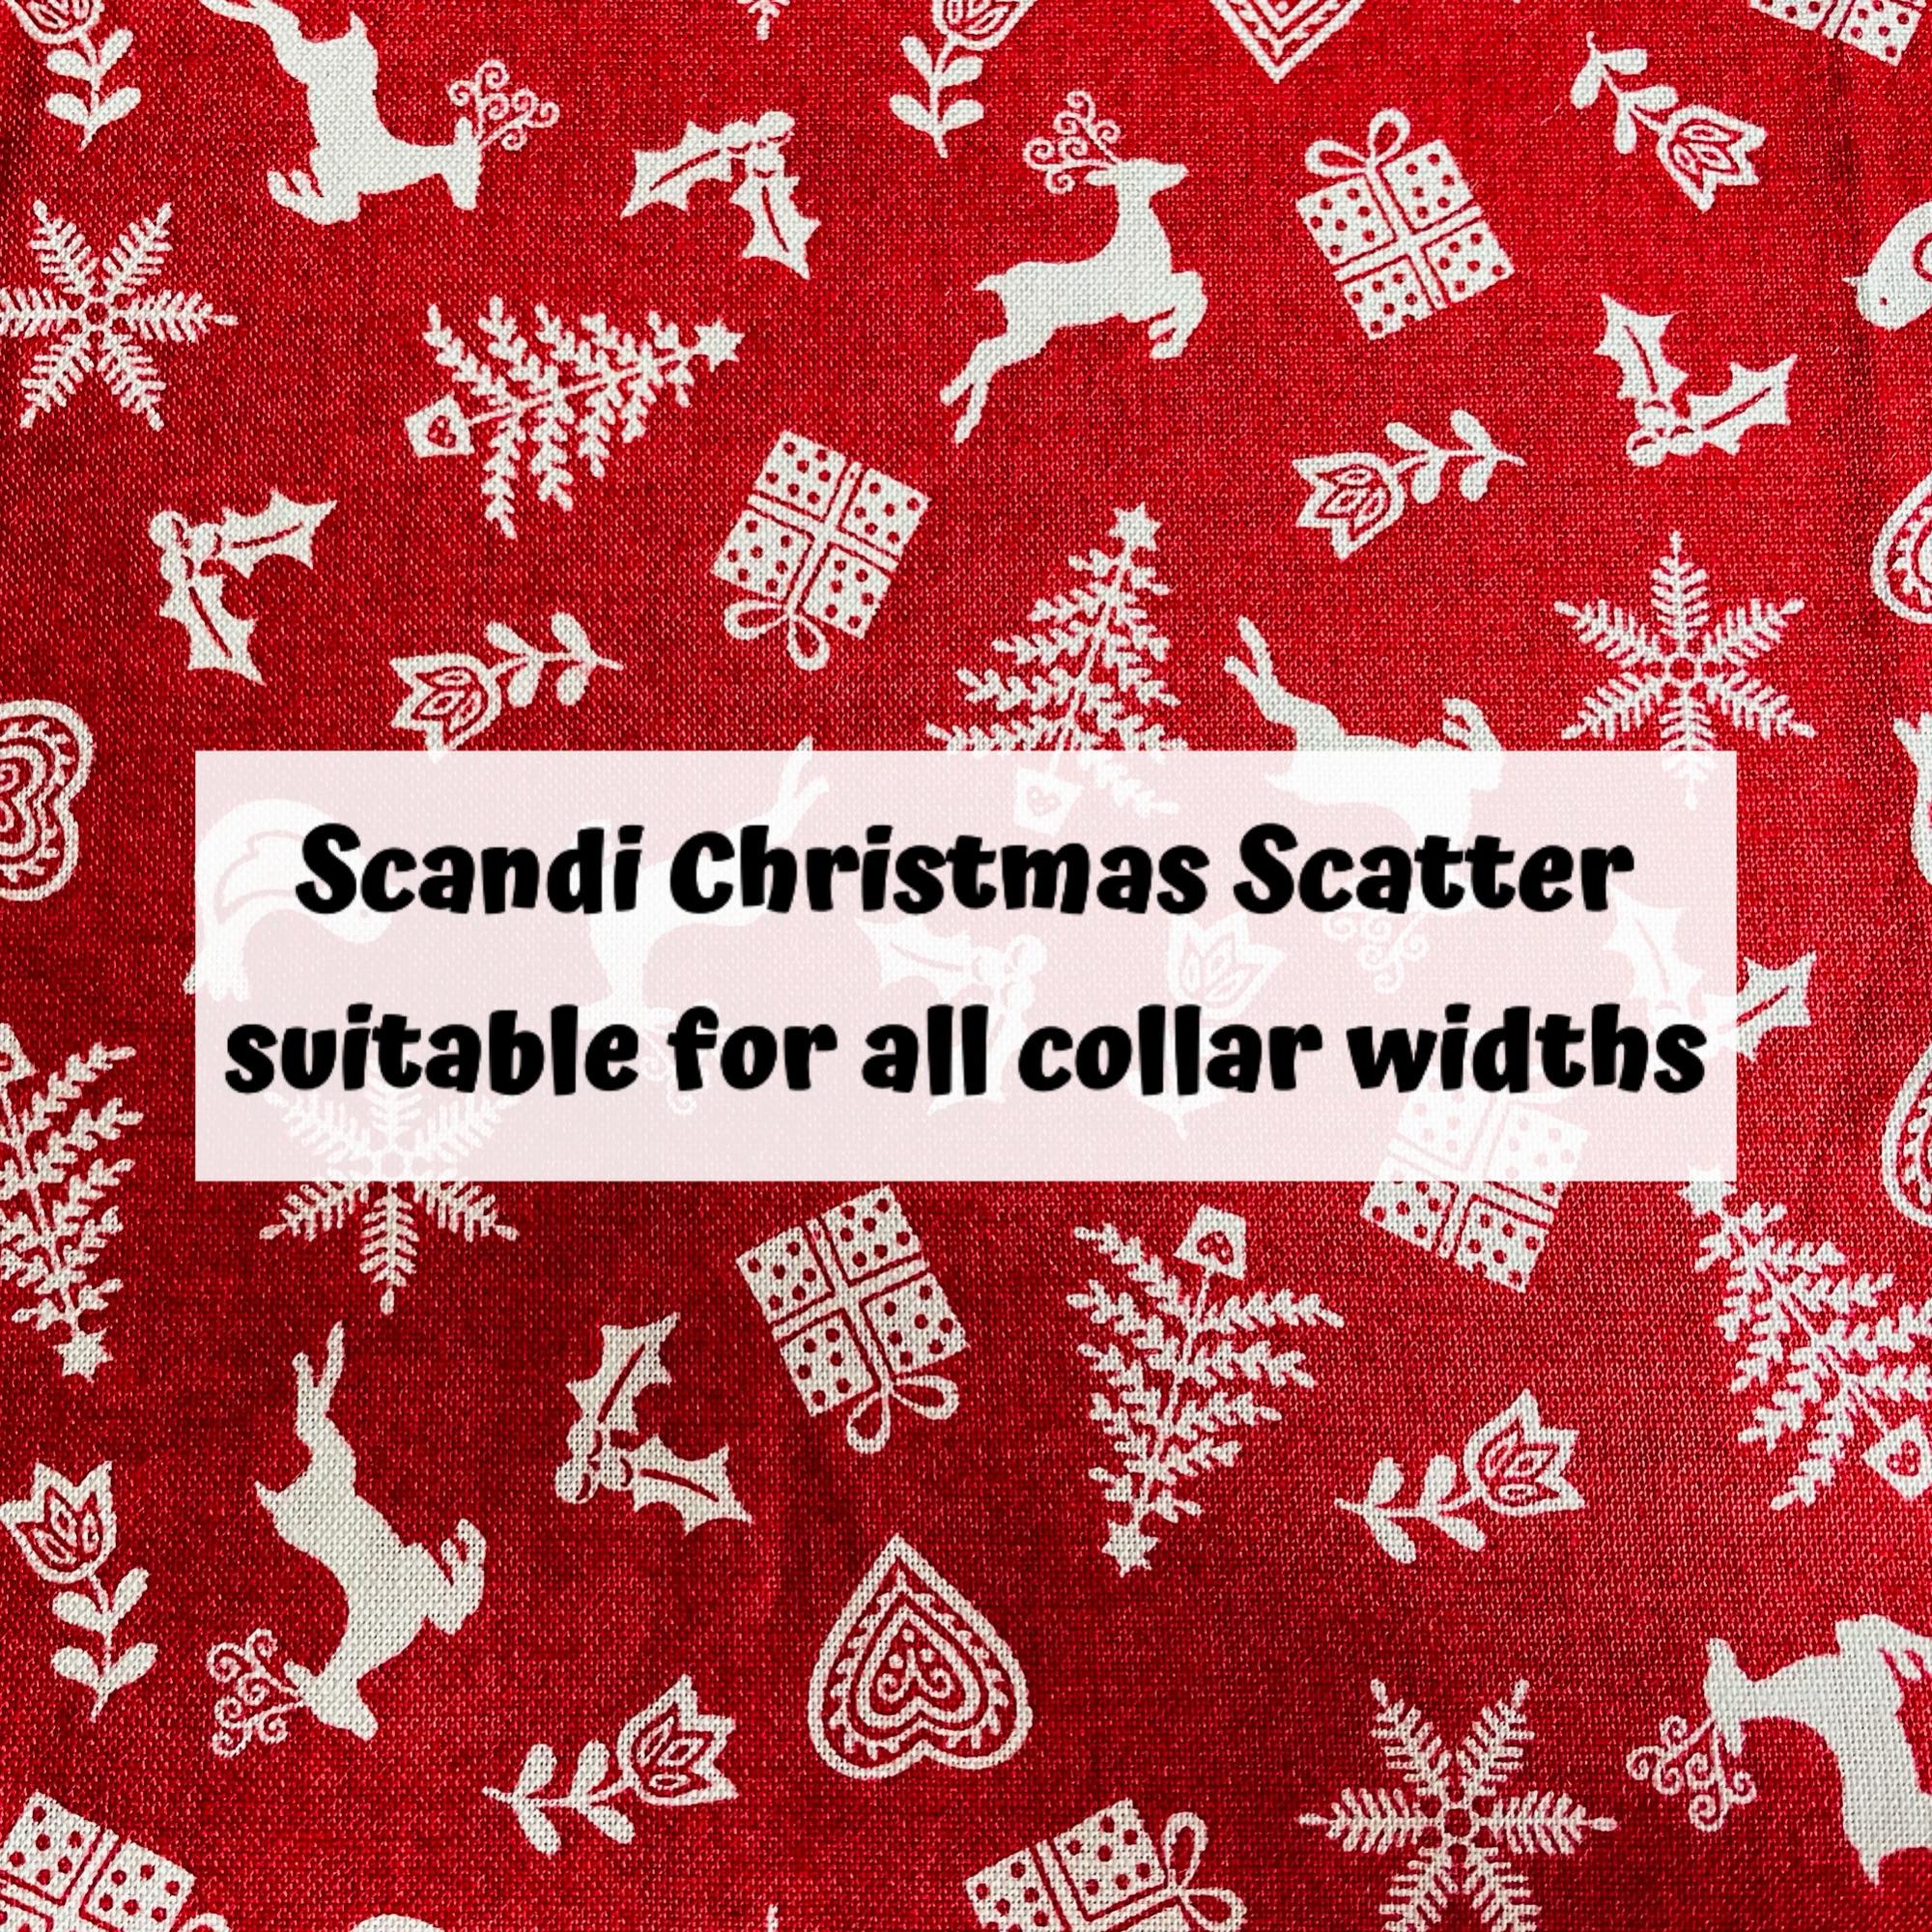 Scandi Christmas Scatter